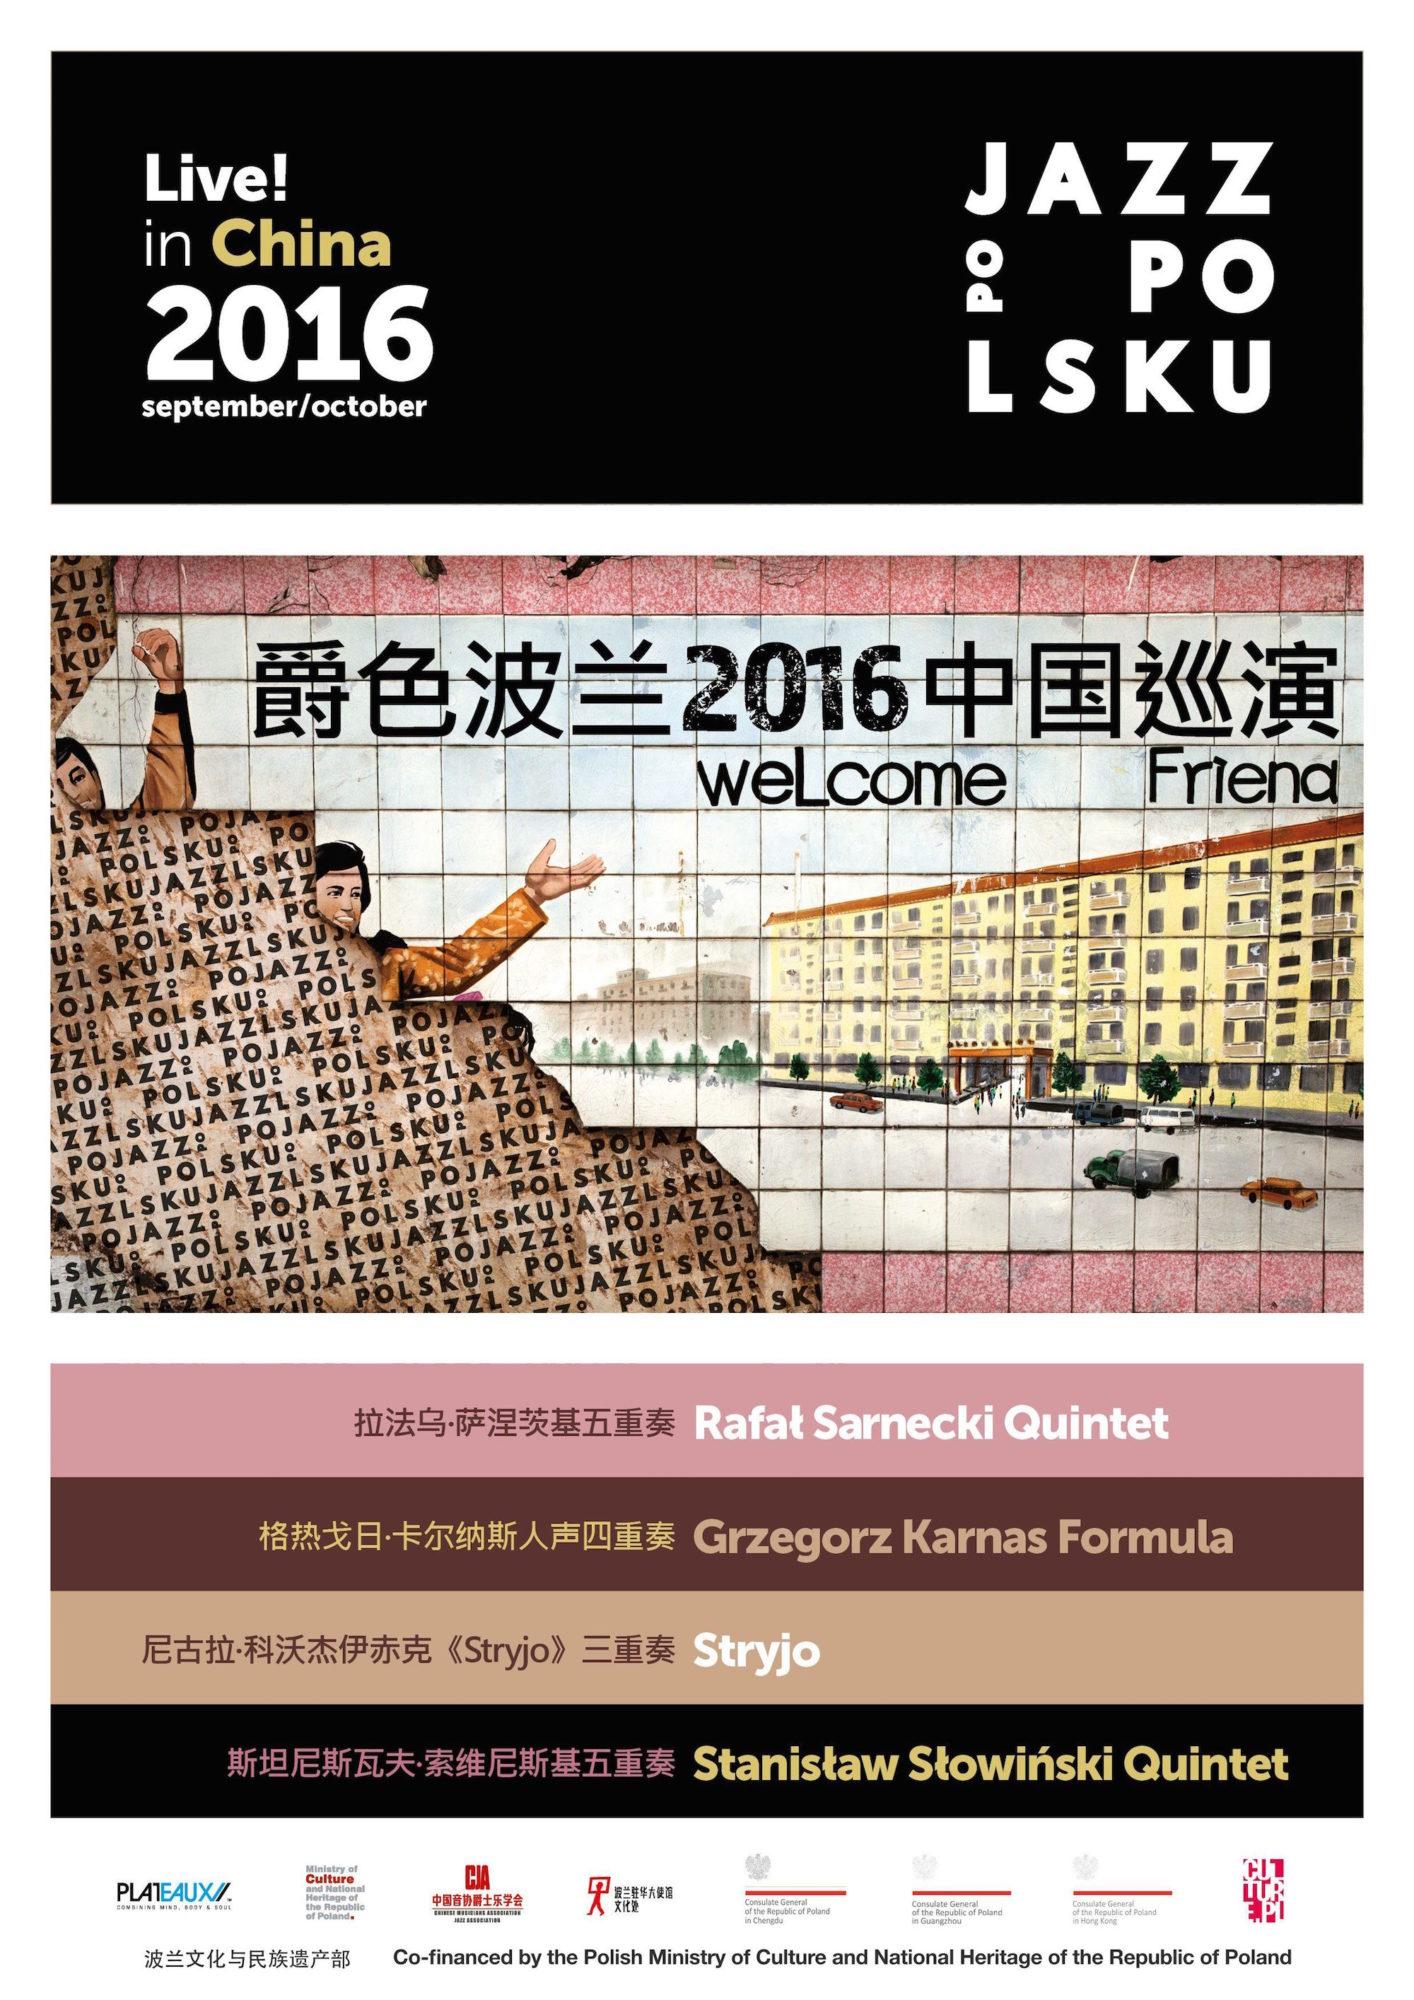 final_jazzpopolsku_liveinchina2016_poster_a2_150dpi-kopia